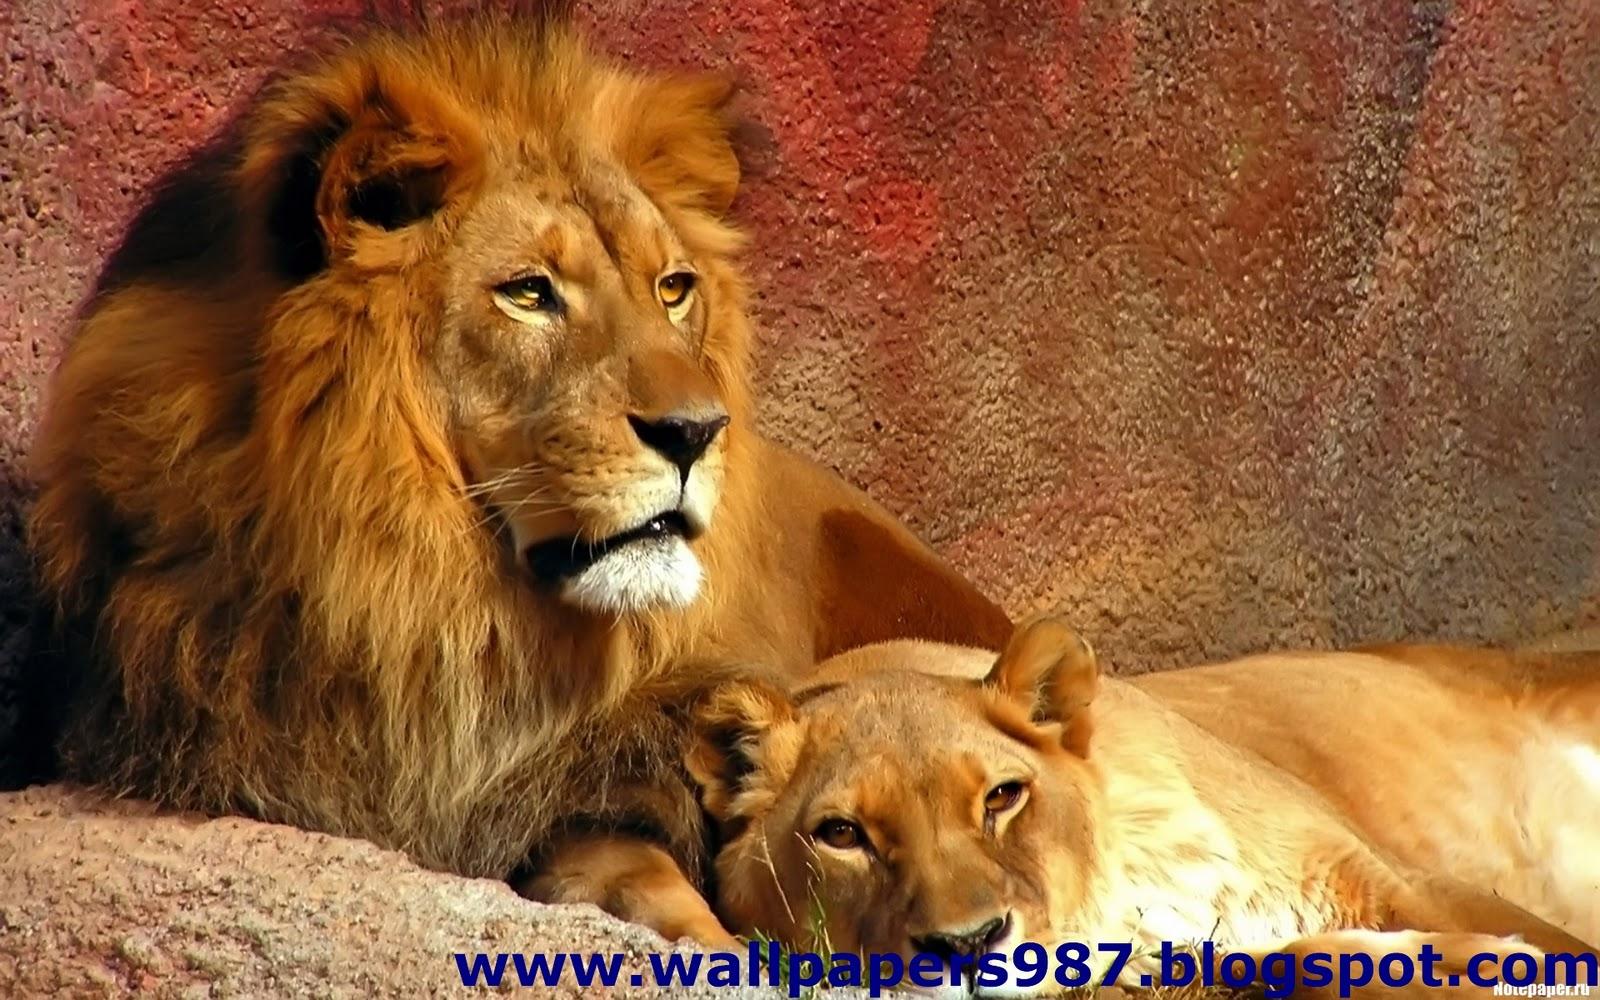 http://2.bp.blogspot.com/_SOSNZoTv8ng/TQYWUD5HCSI/AAAAAAAAAHQ/PuPc7dCXY3o/s1600/windows_masaustu_arka_plan_resimleri_vahsi_kediler_aslan_kaplan_HD_HQ_Full_Animal.+Pic+%252894%2529+%25281%2529.jpg